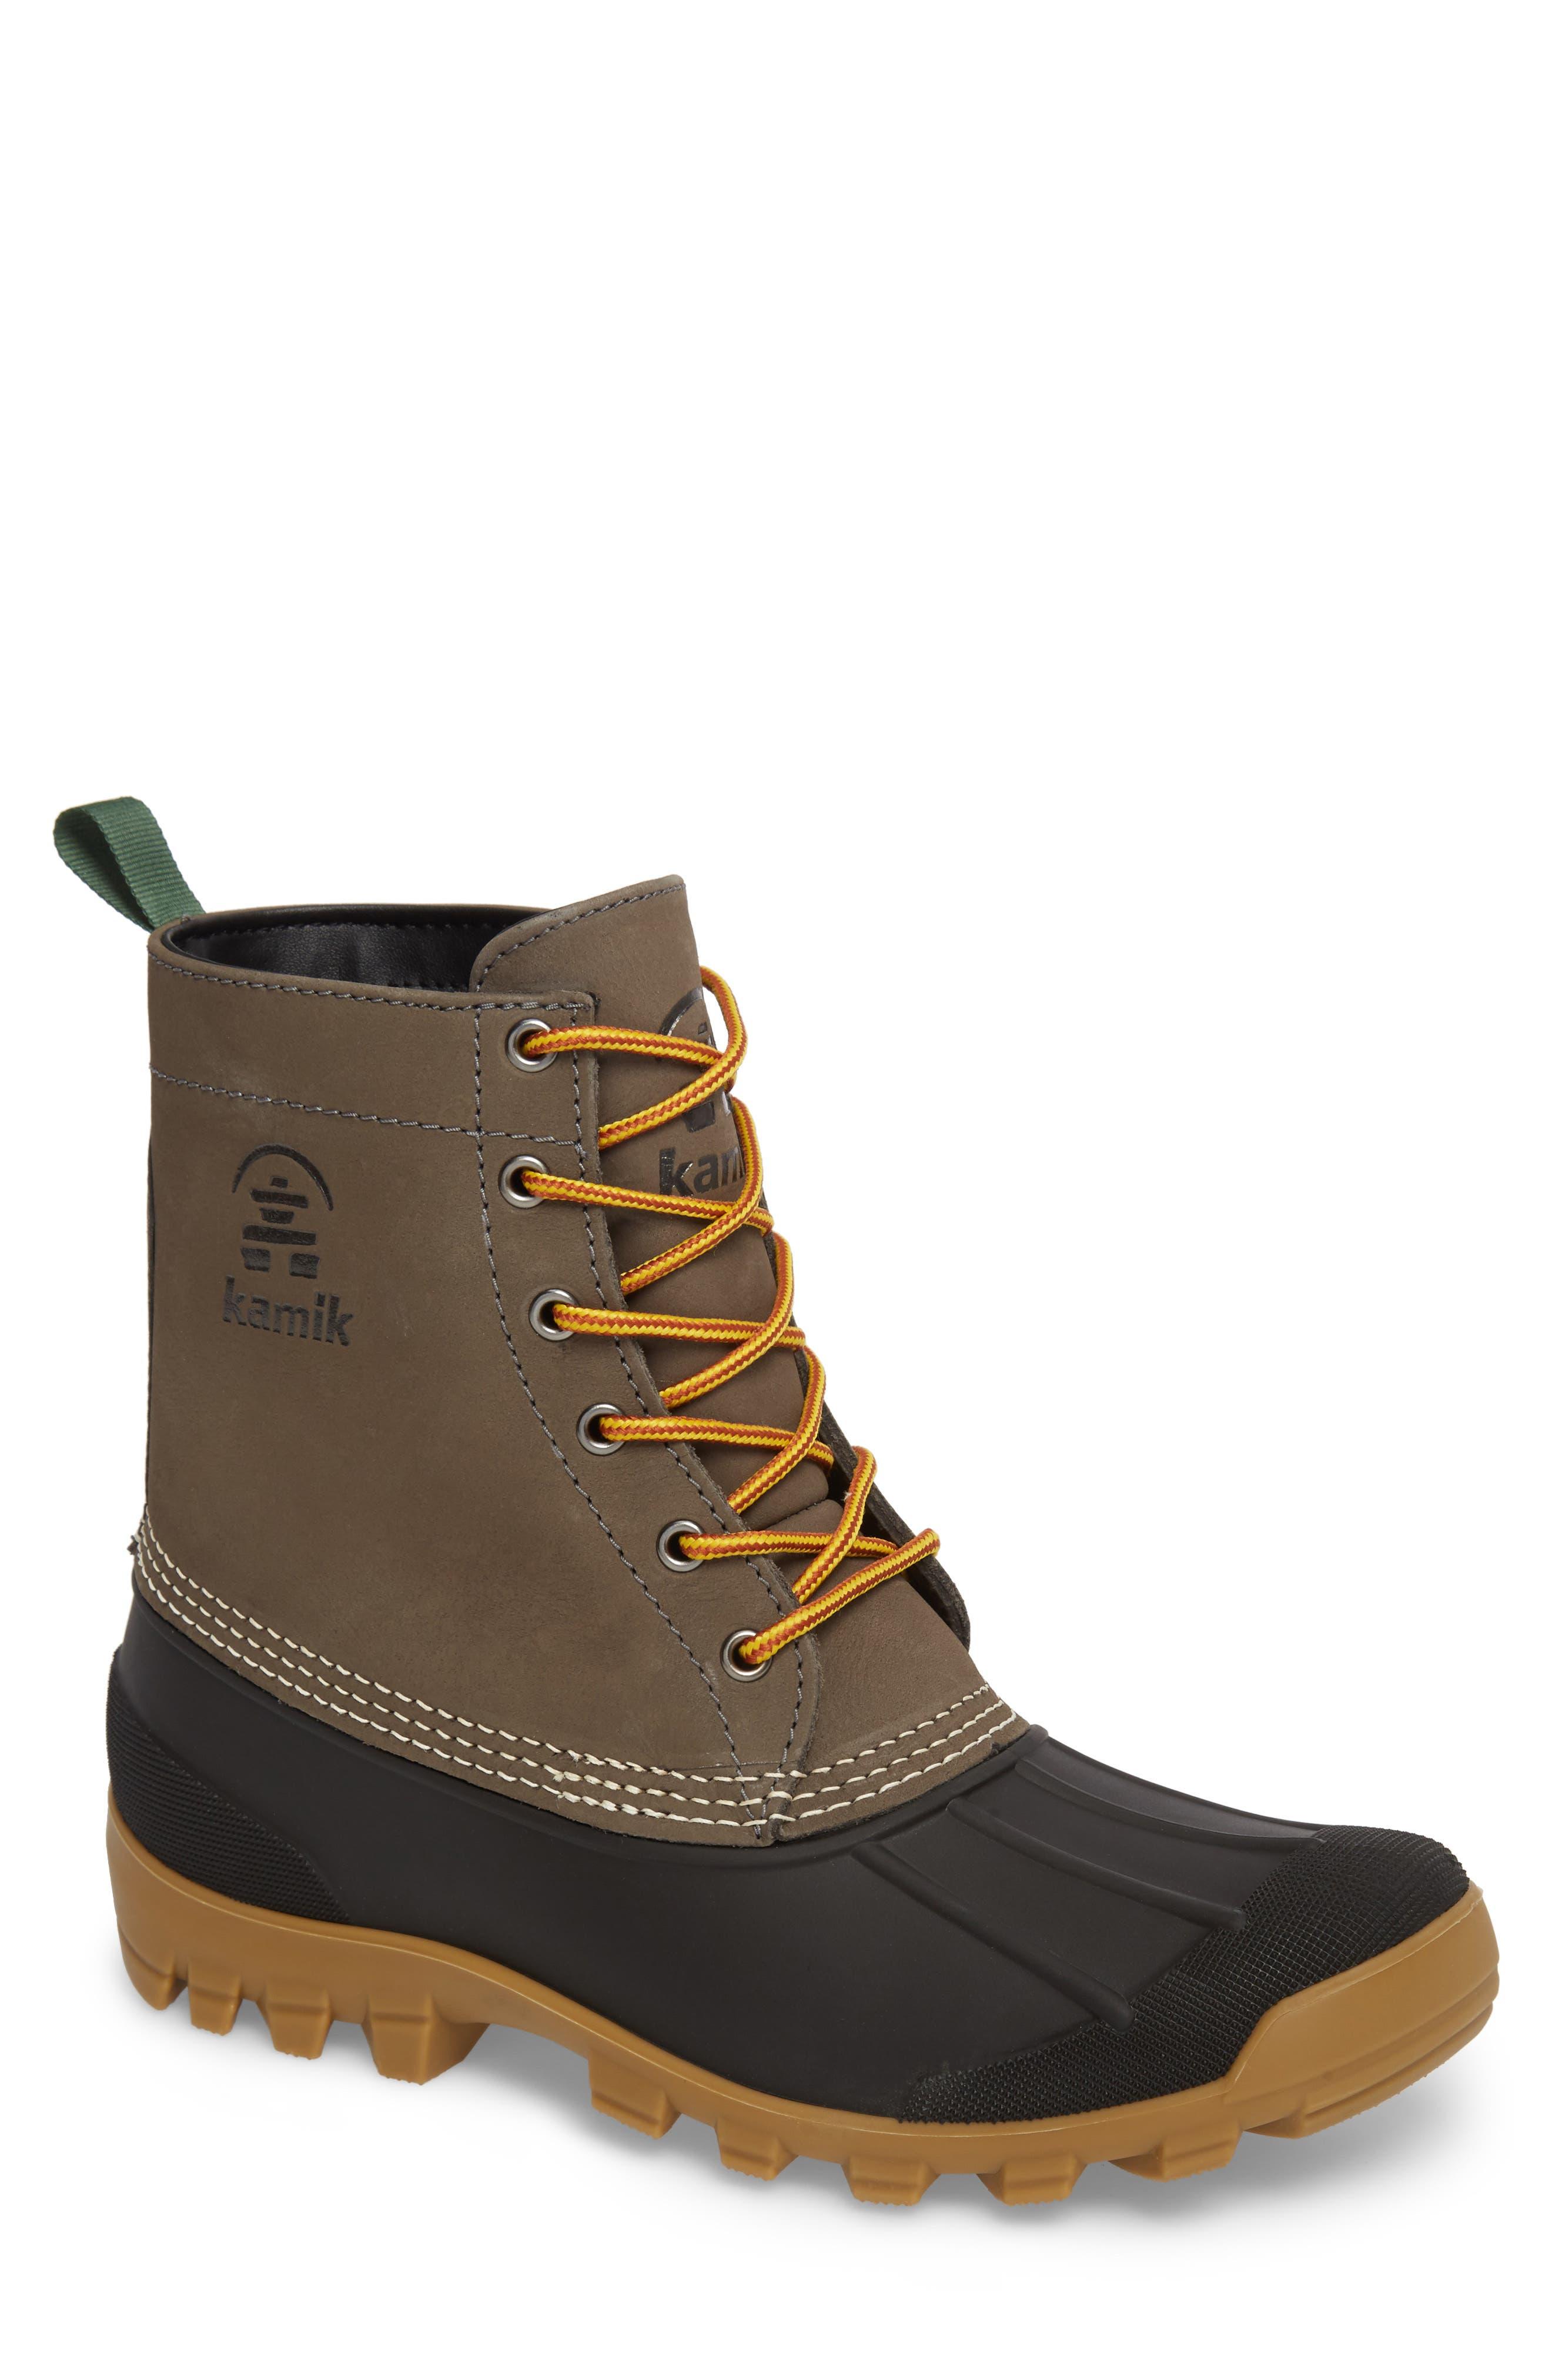 Yukon 6 Waterproof Insulated Three-Season Boot,                         Main,                         color, CHARCOAL LEATHER